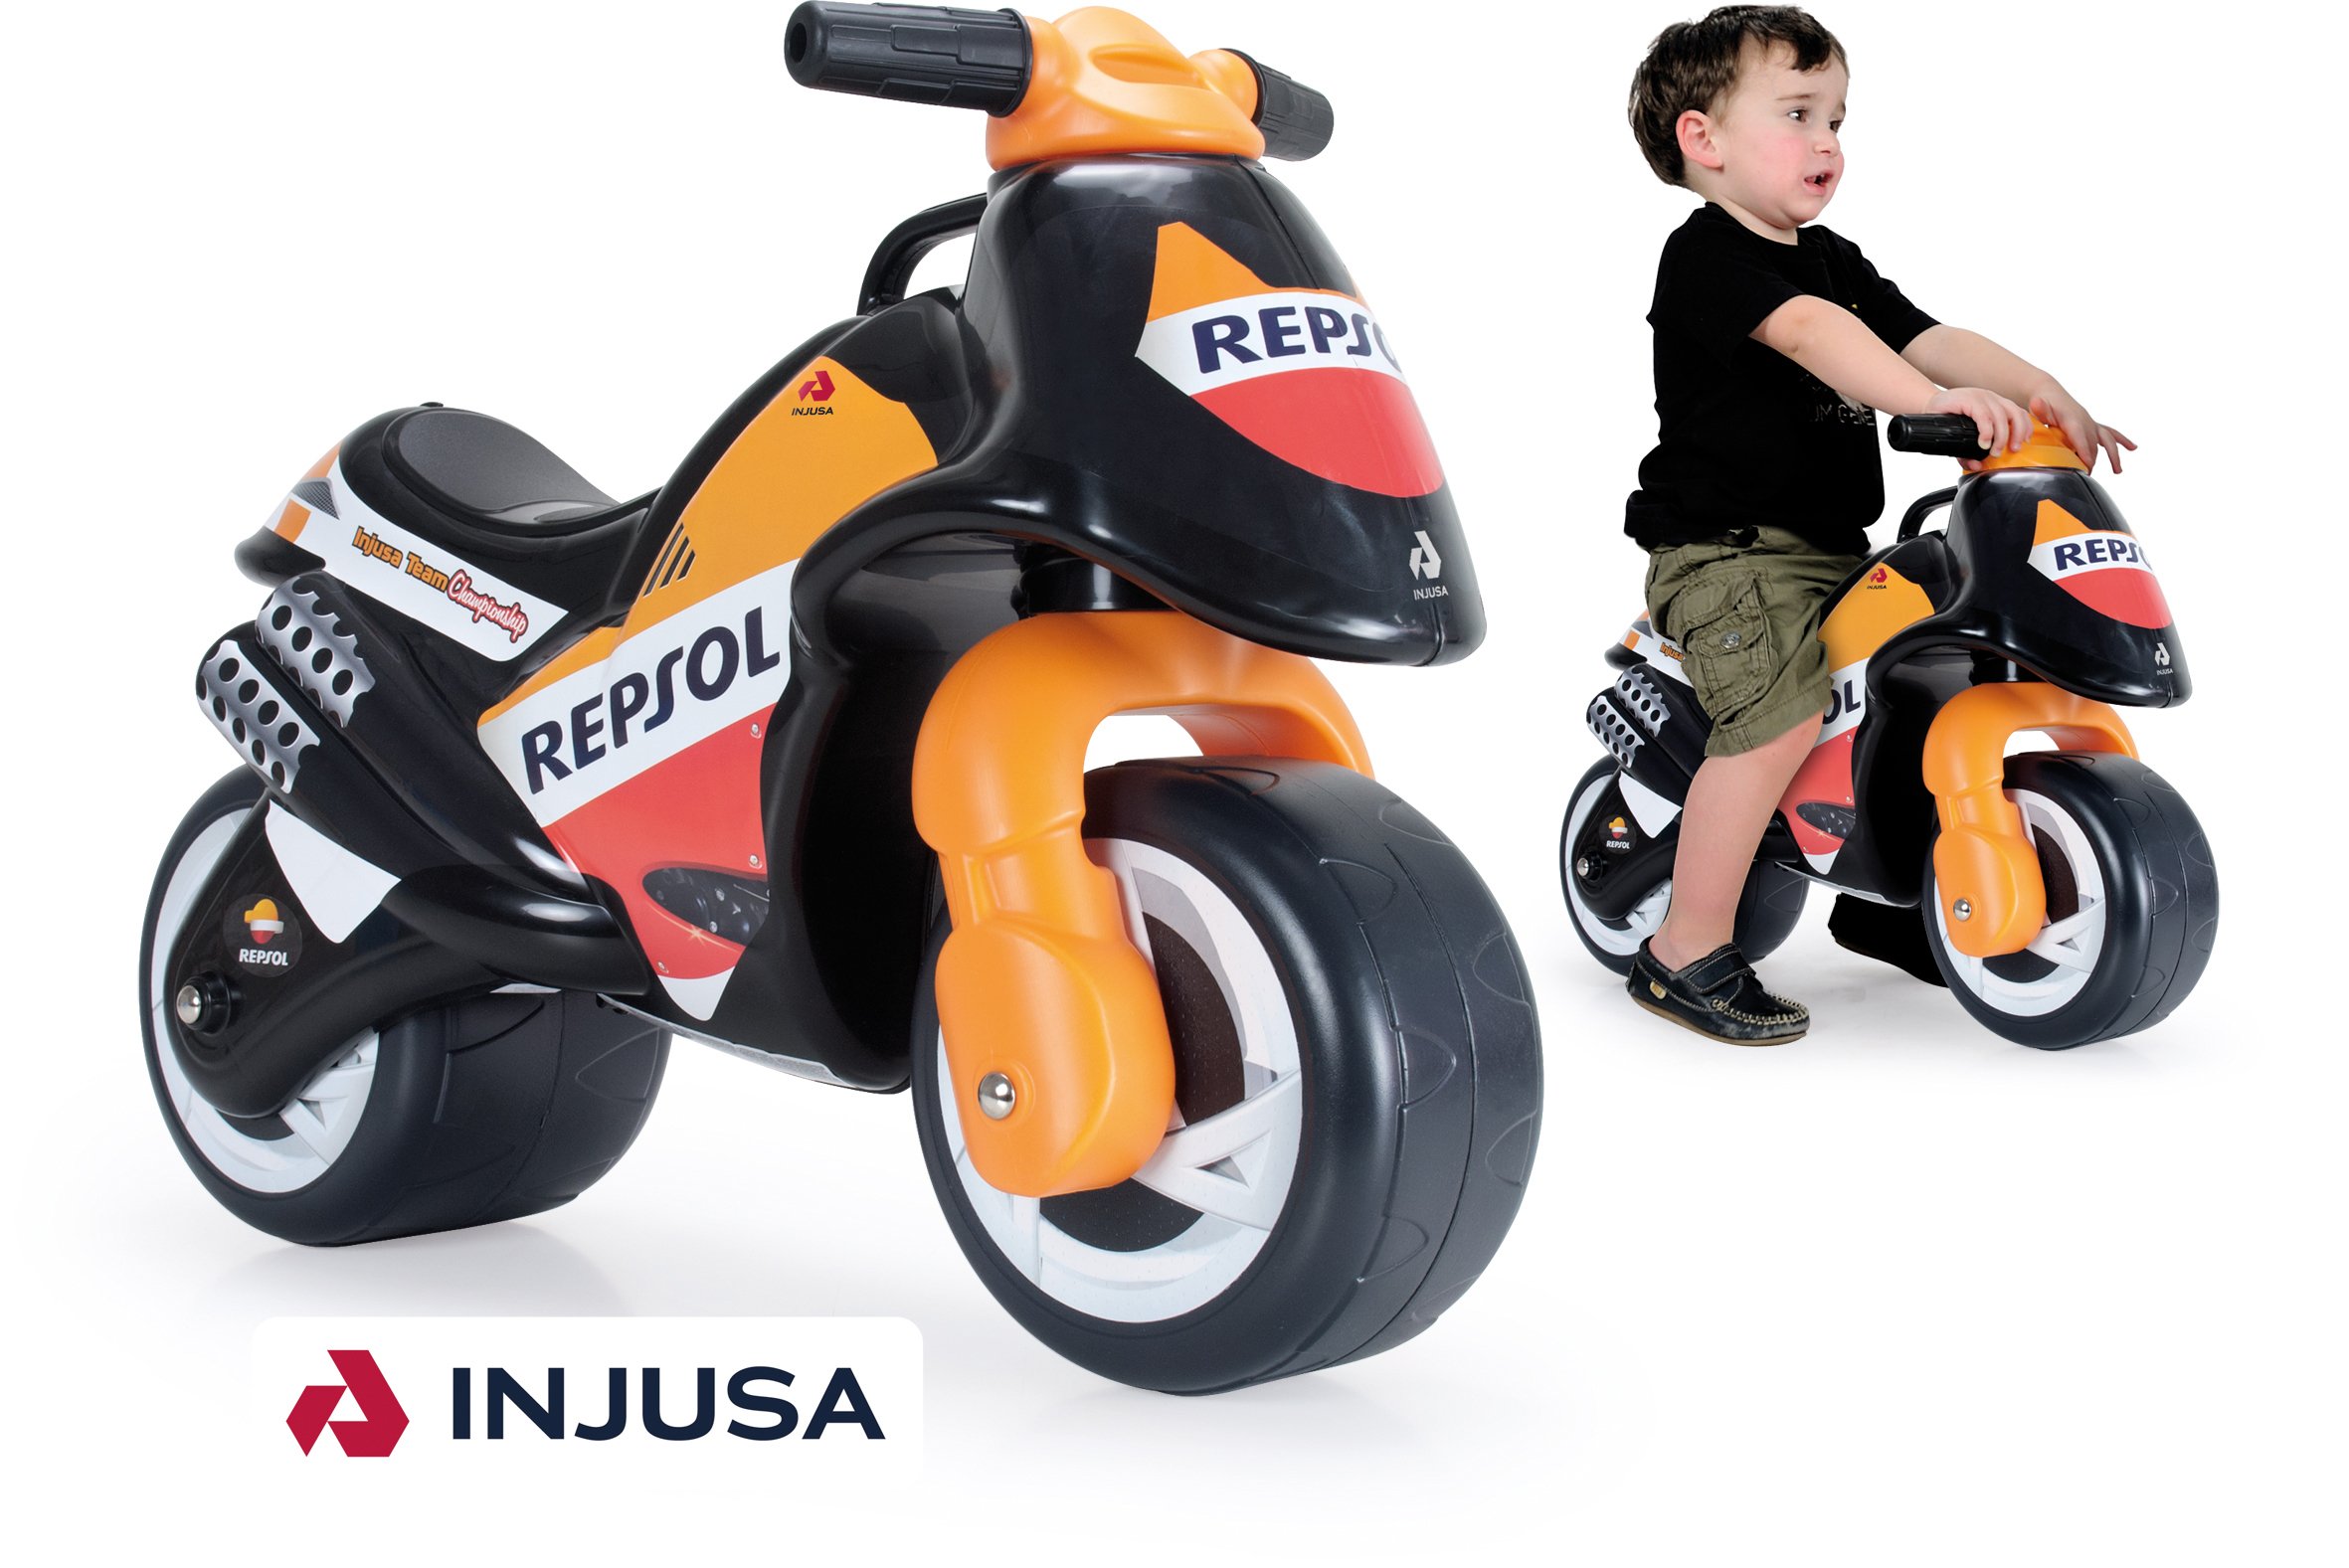 MOTO NEOX REPSOL 1901 - N37419